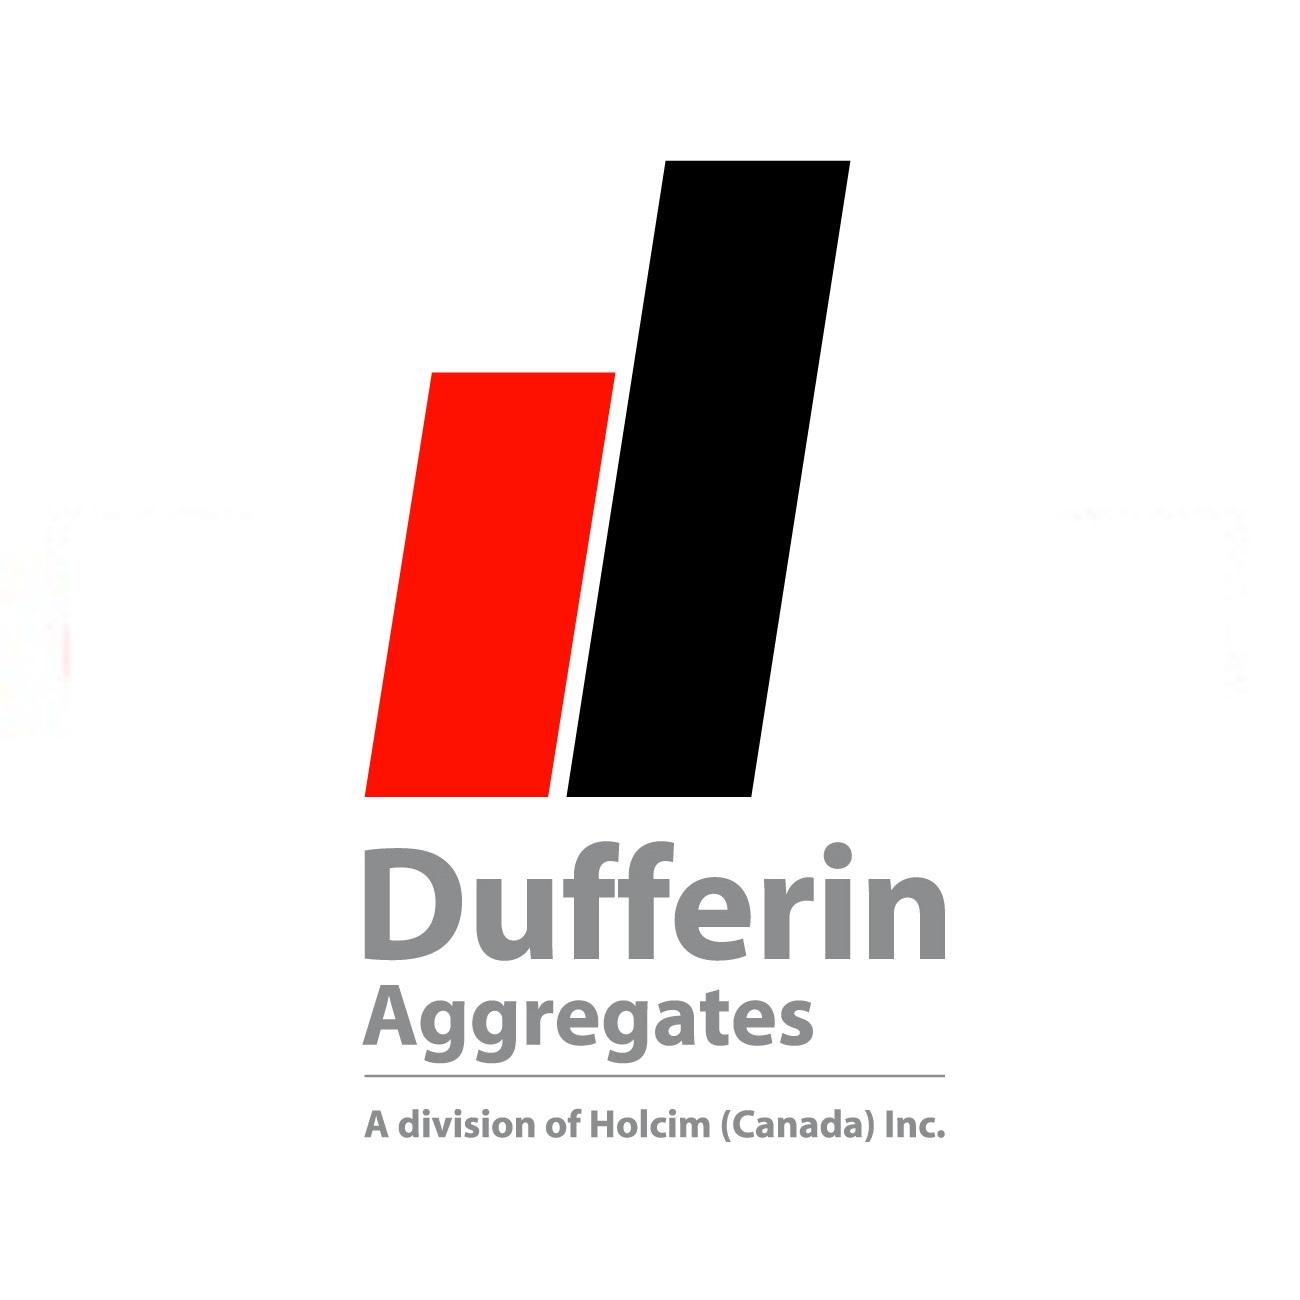 Dufferin Aggregates logo